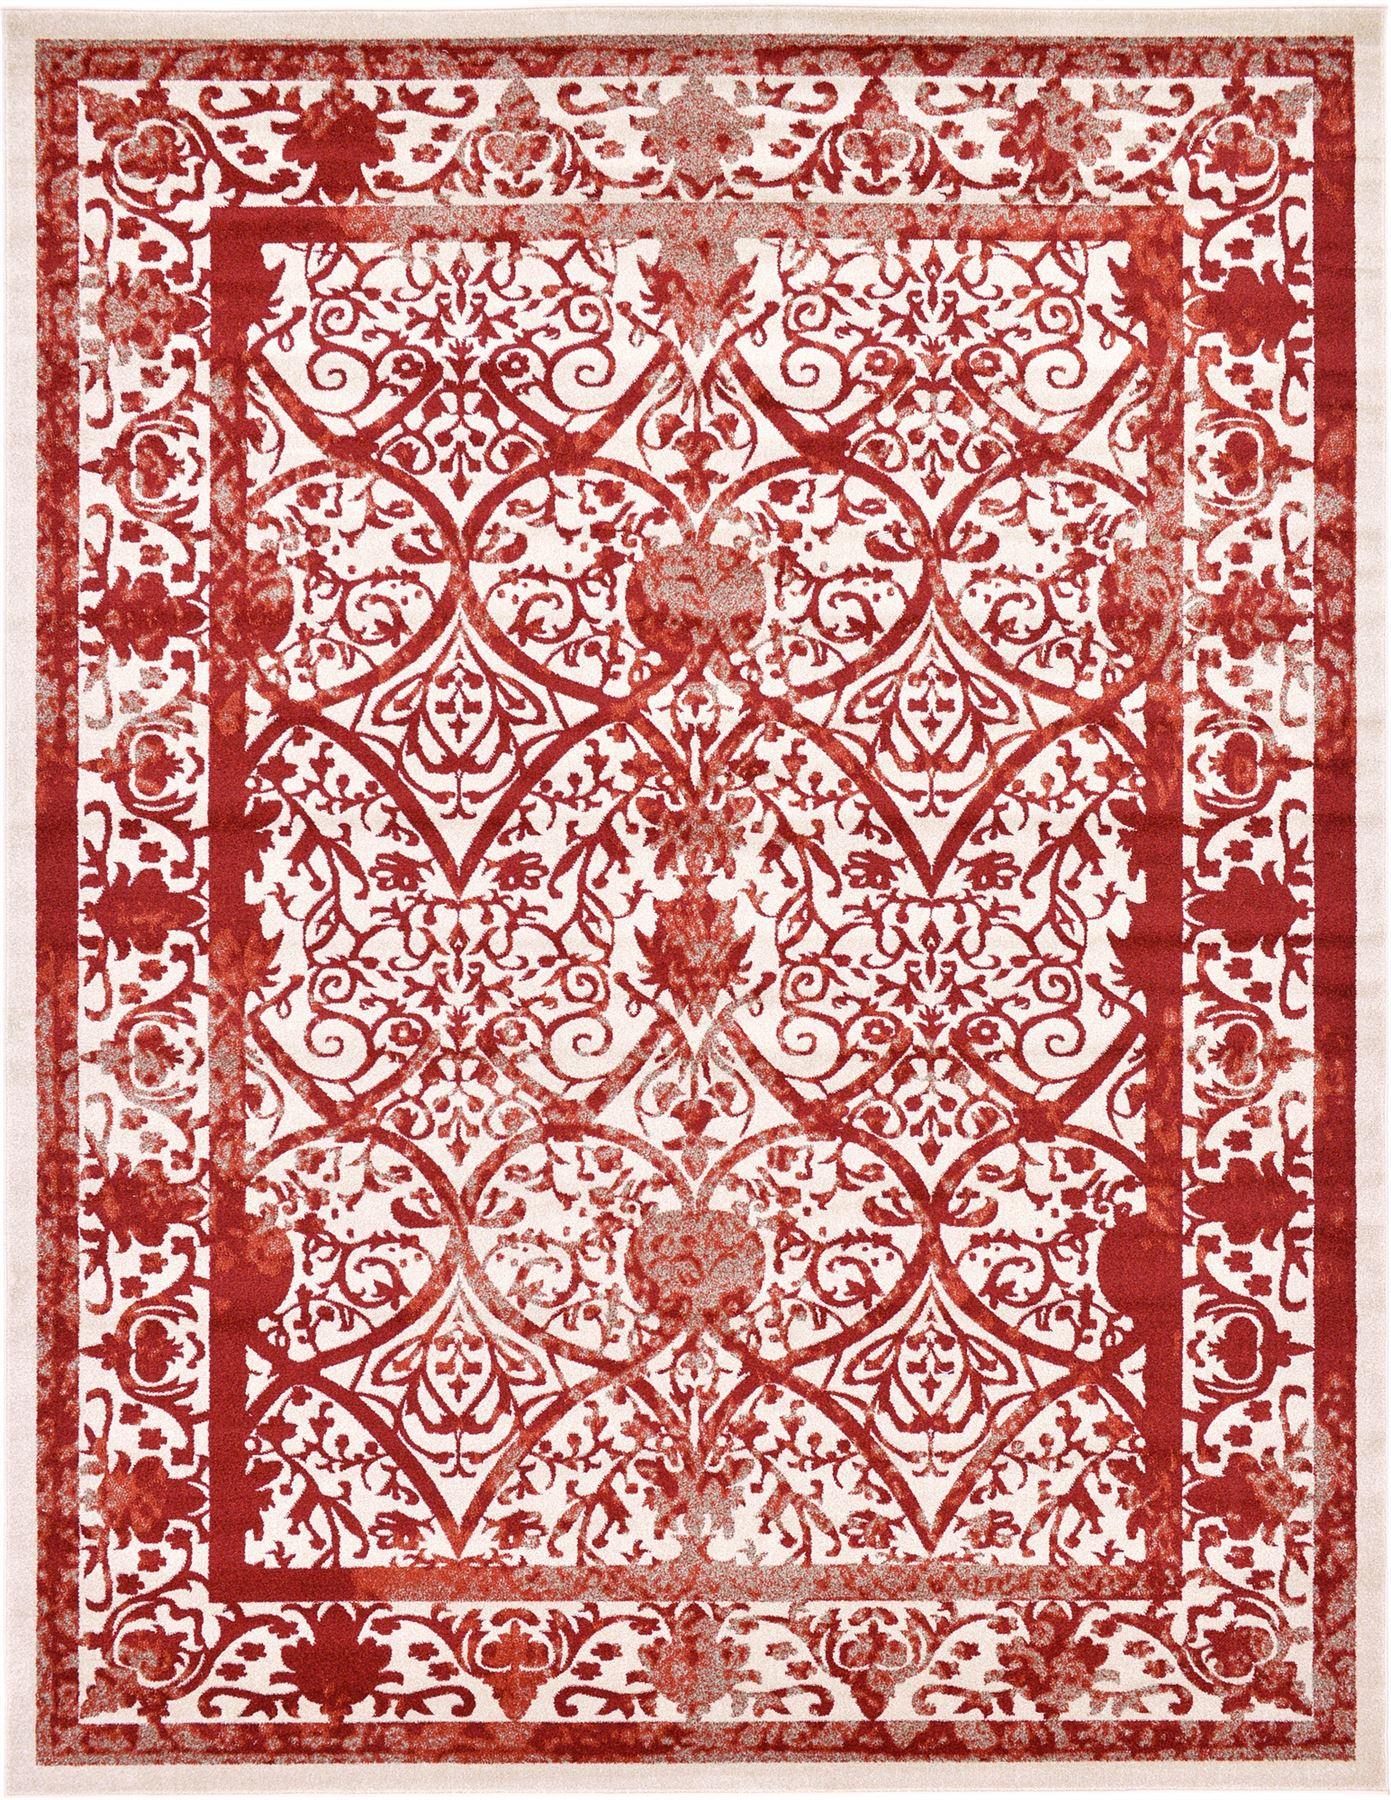 Oriental Rugs Persian Design Traditional Carpet Area Rugs